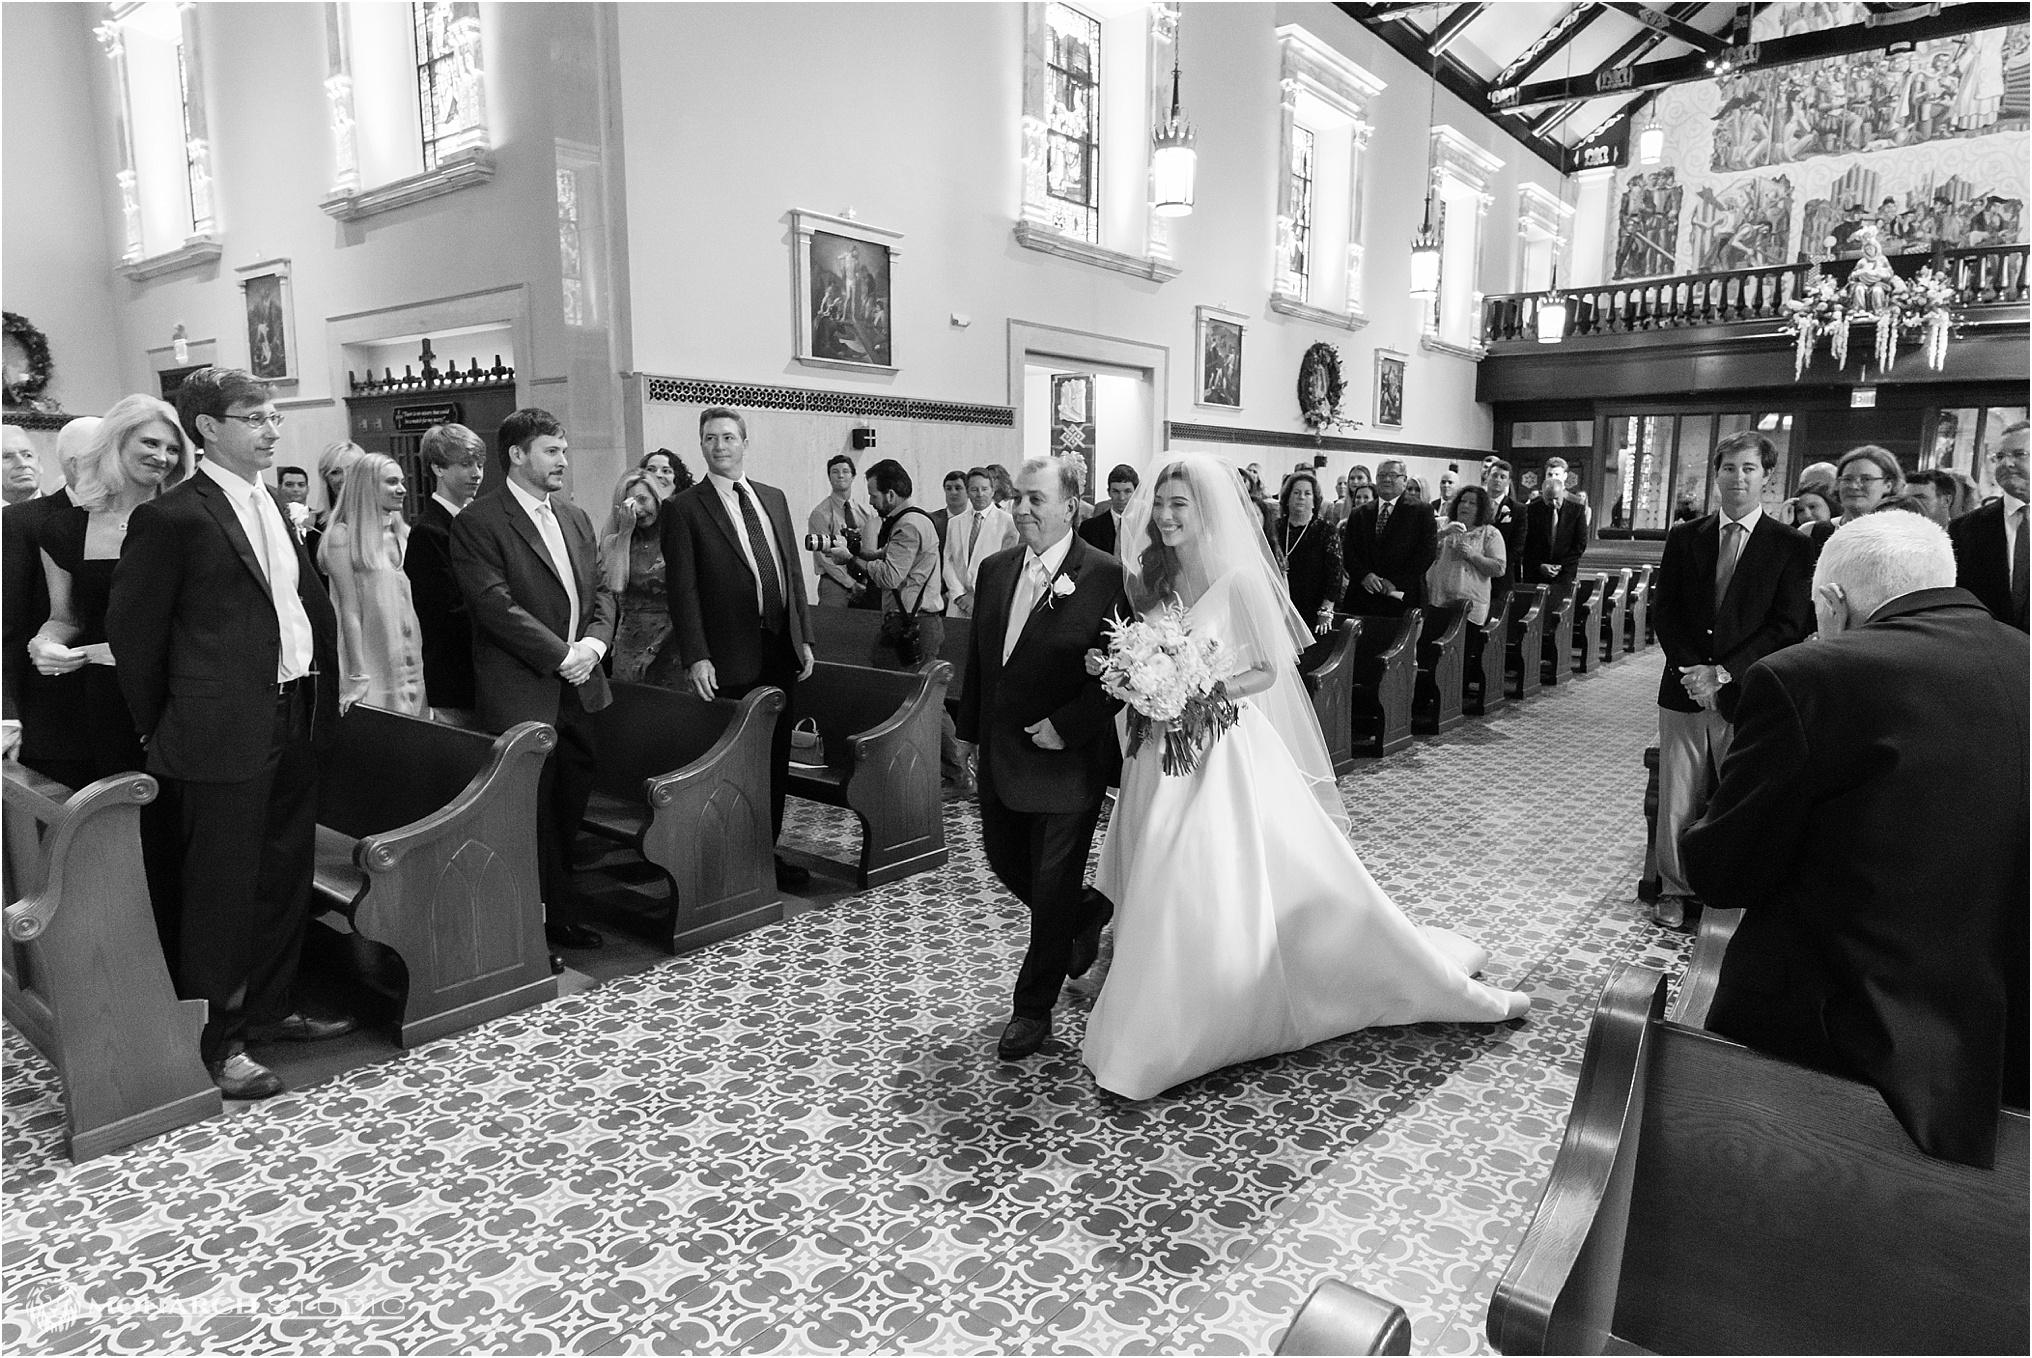 st-augustine-wedding-photographer-048.jpg